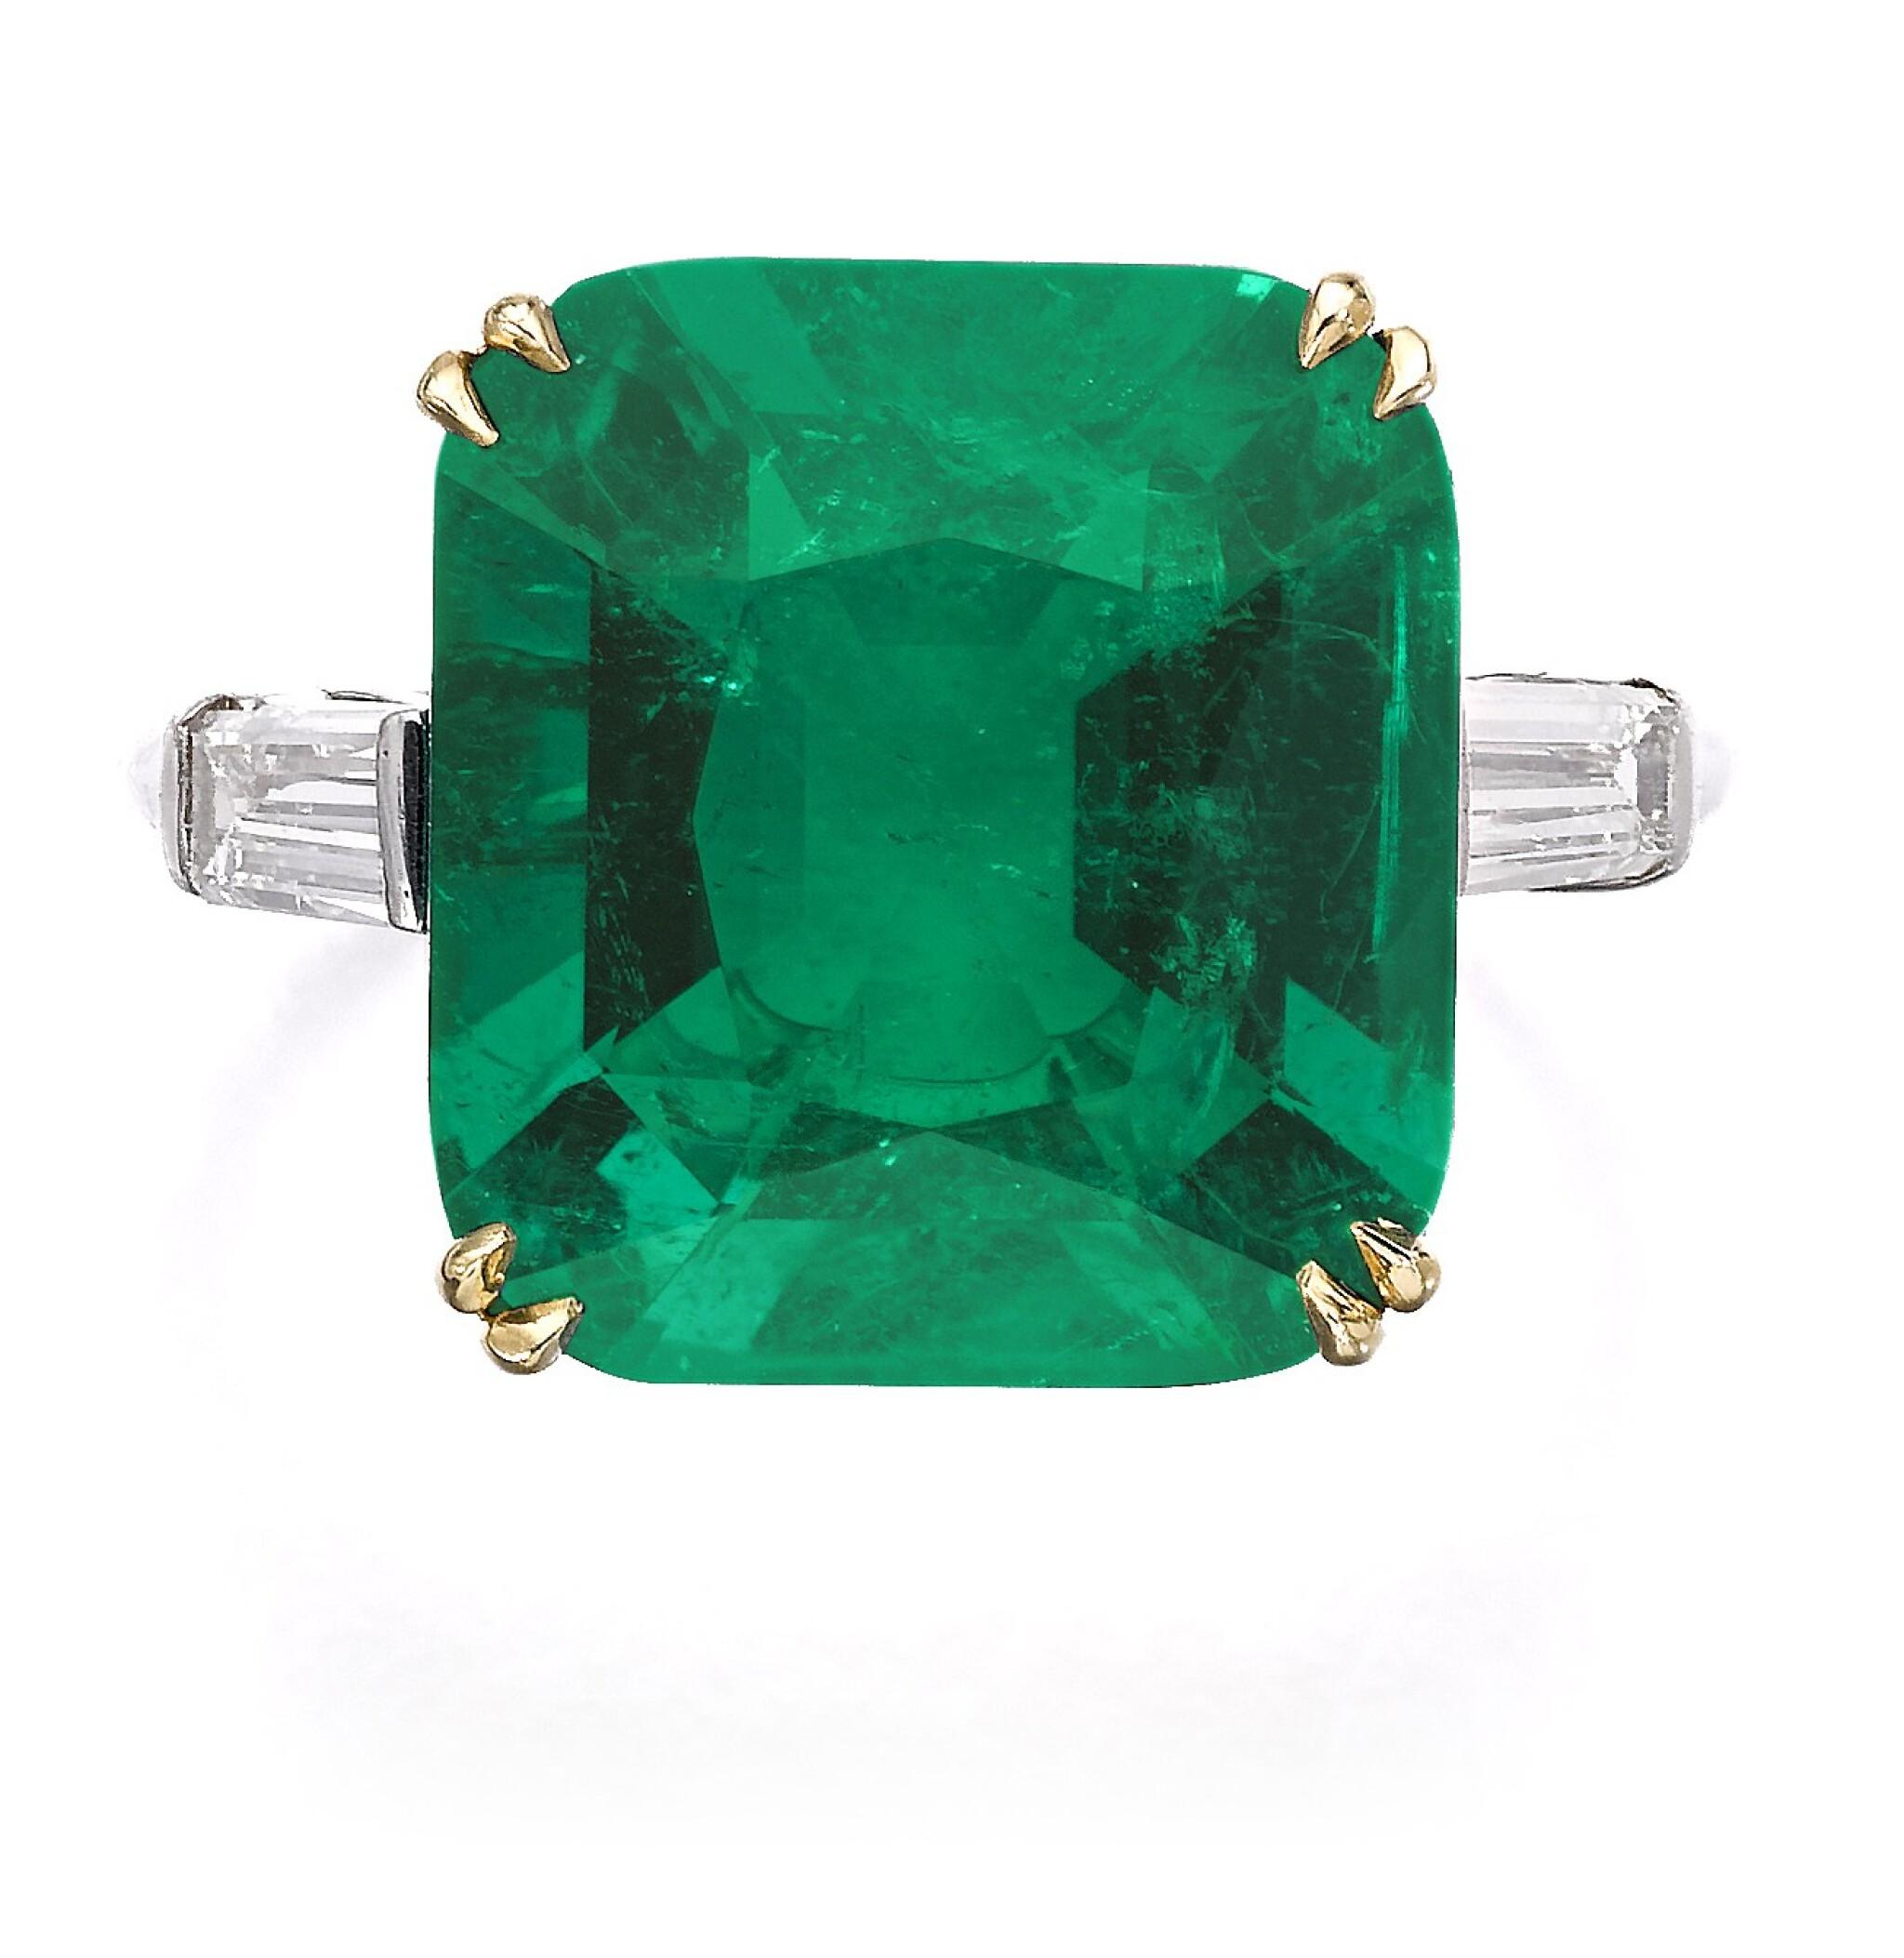 View full screen - View 1 of Lot 137. Harry Winston   Emerald and diamond ring   海瑞溫斯頓   祖母綠配鑽石戒指.